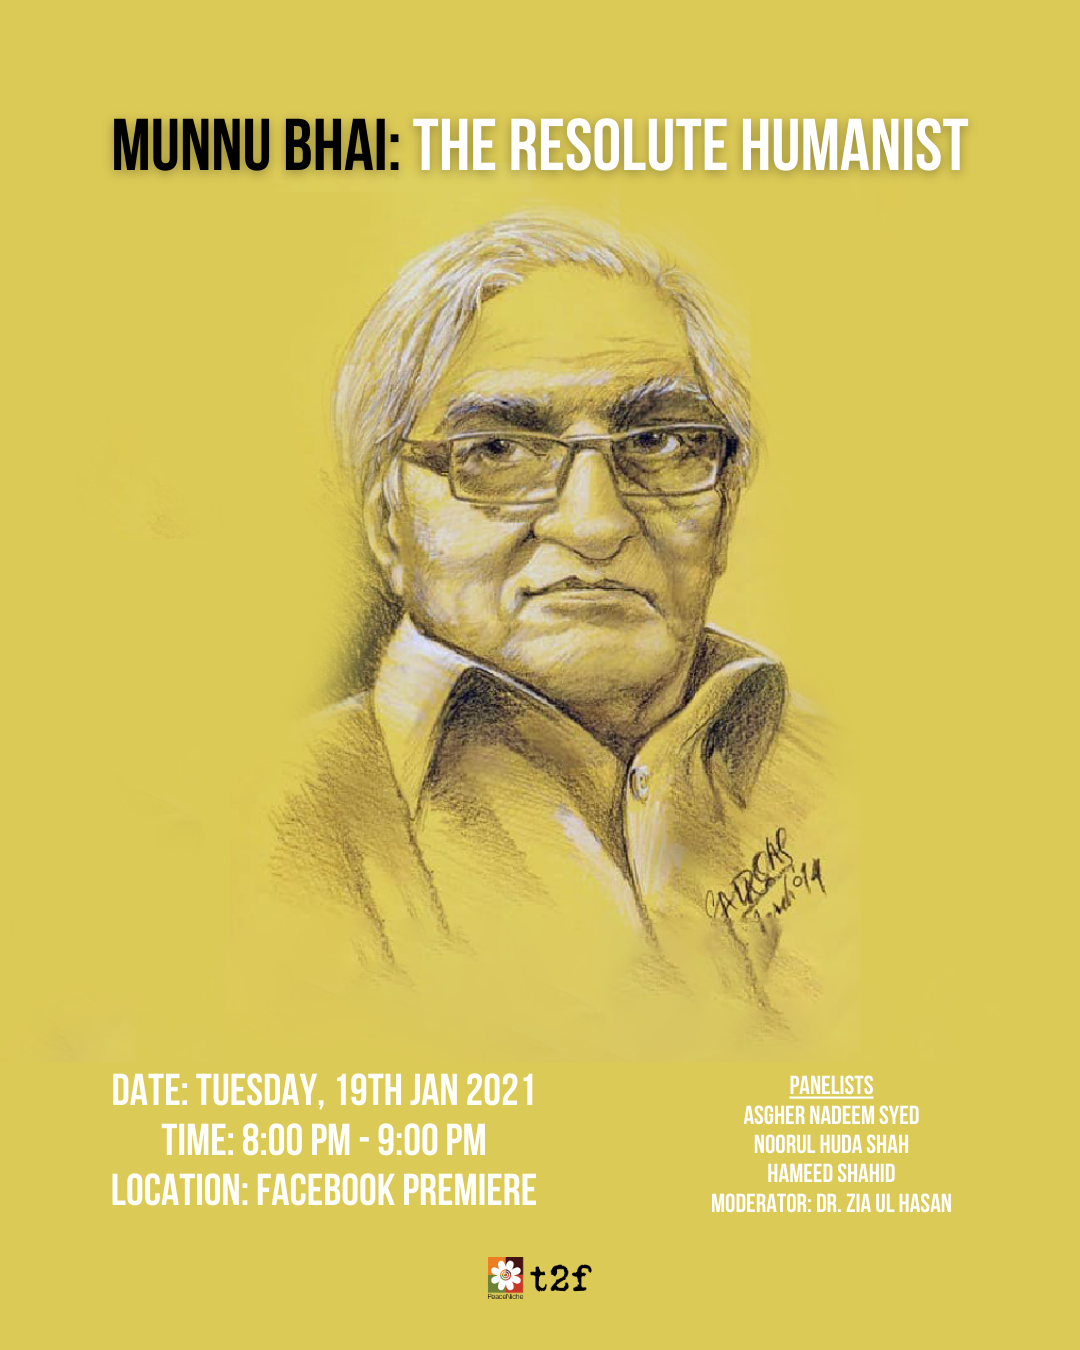 Munnu Bhai: The Resolute Humanist